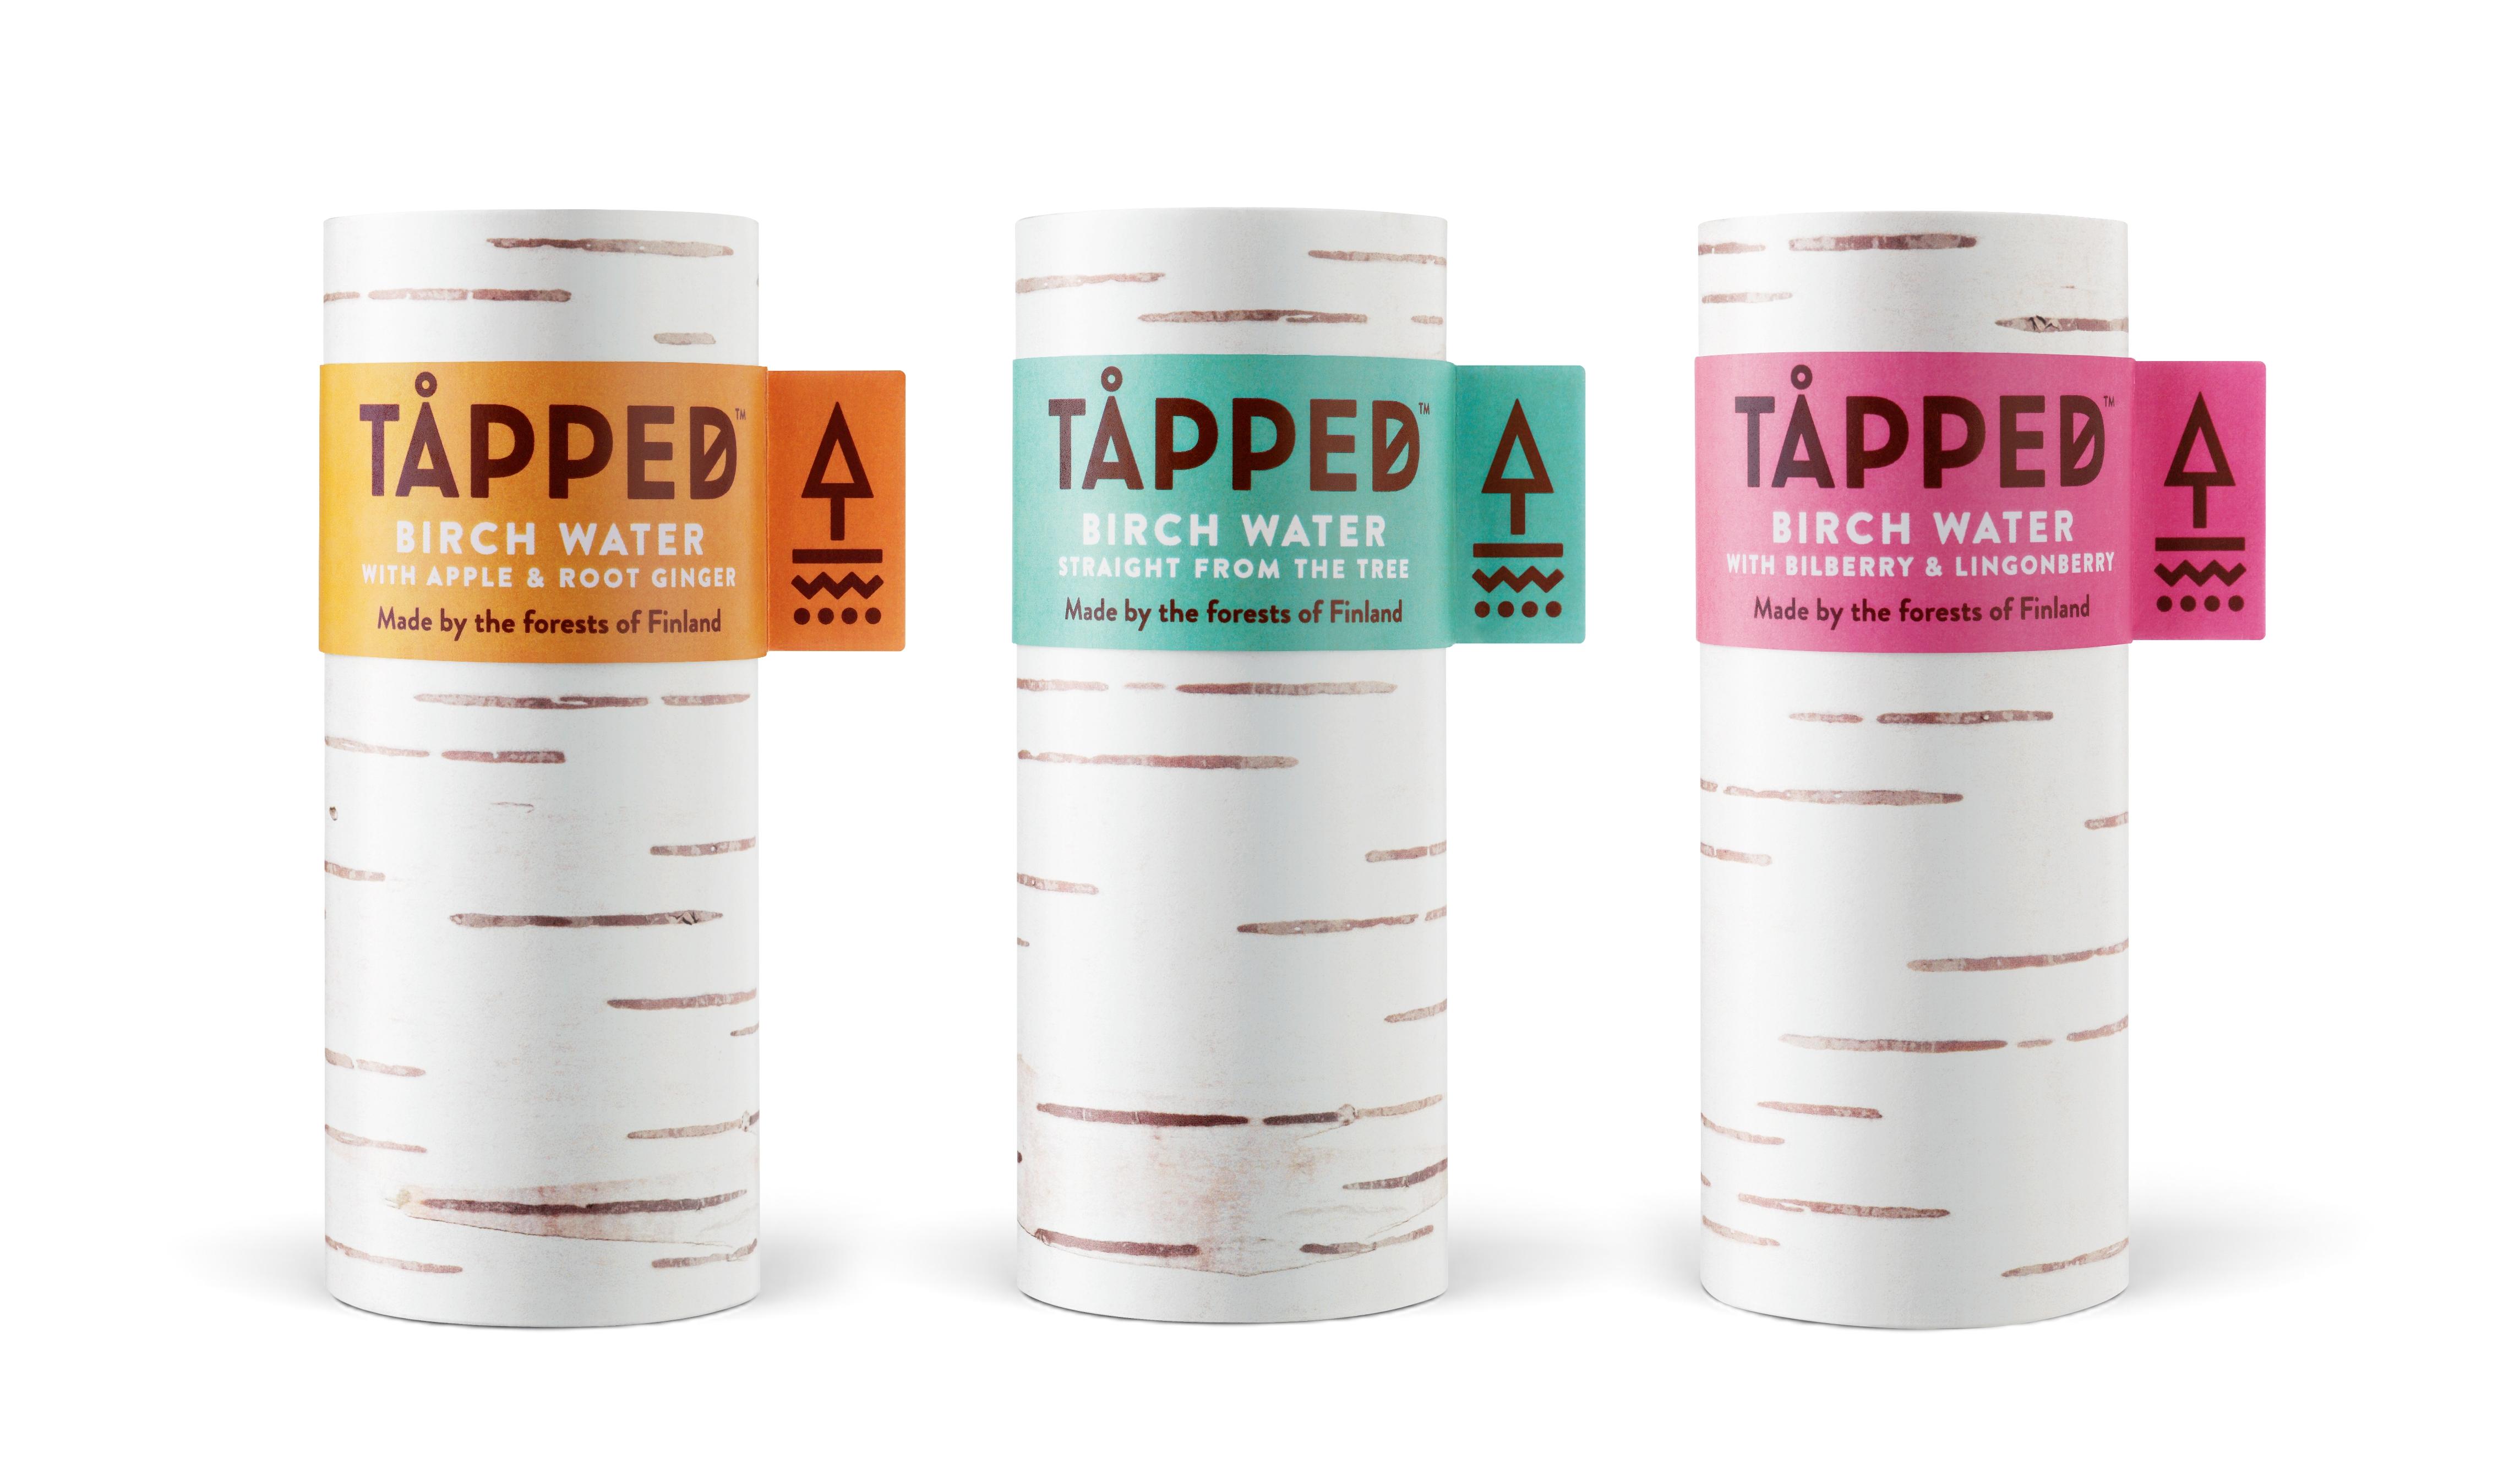 Tapped DrinkPreneur Live 2015